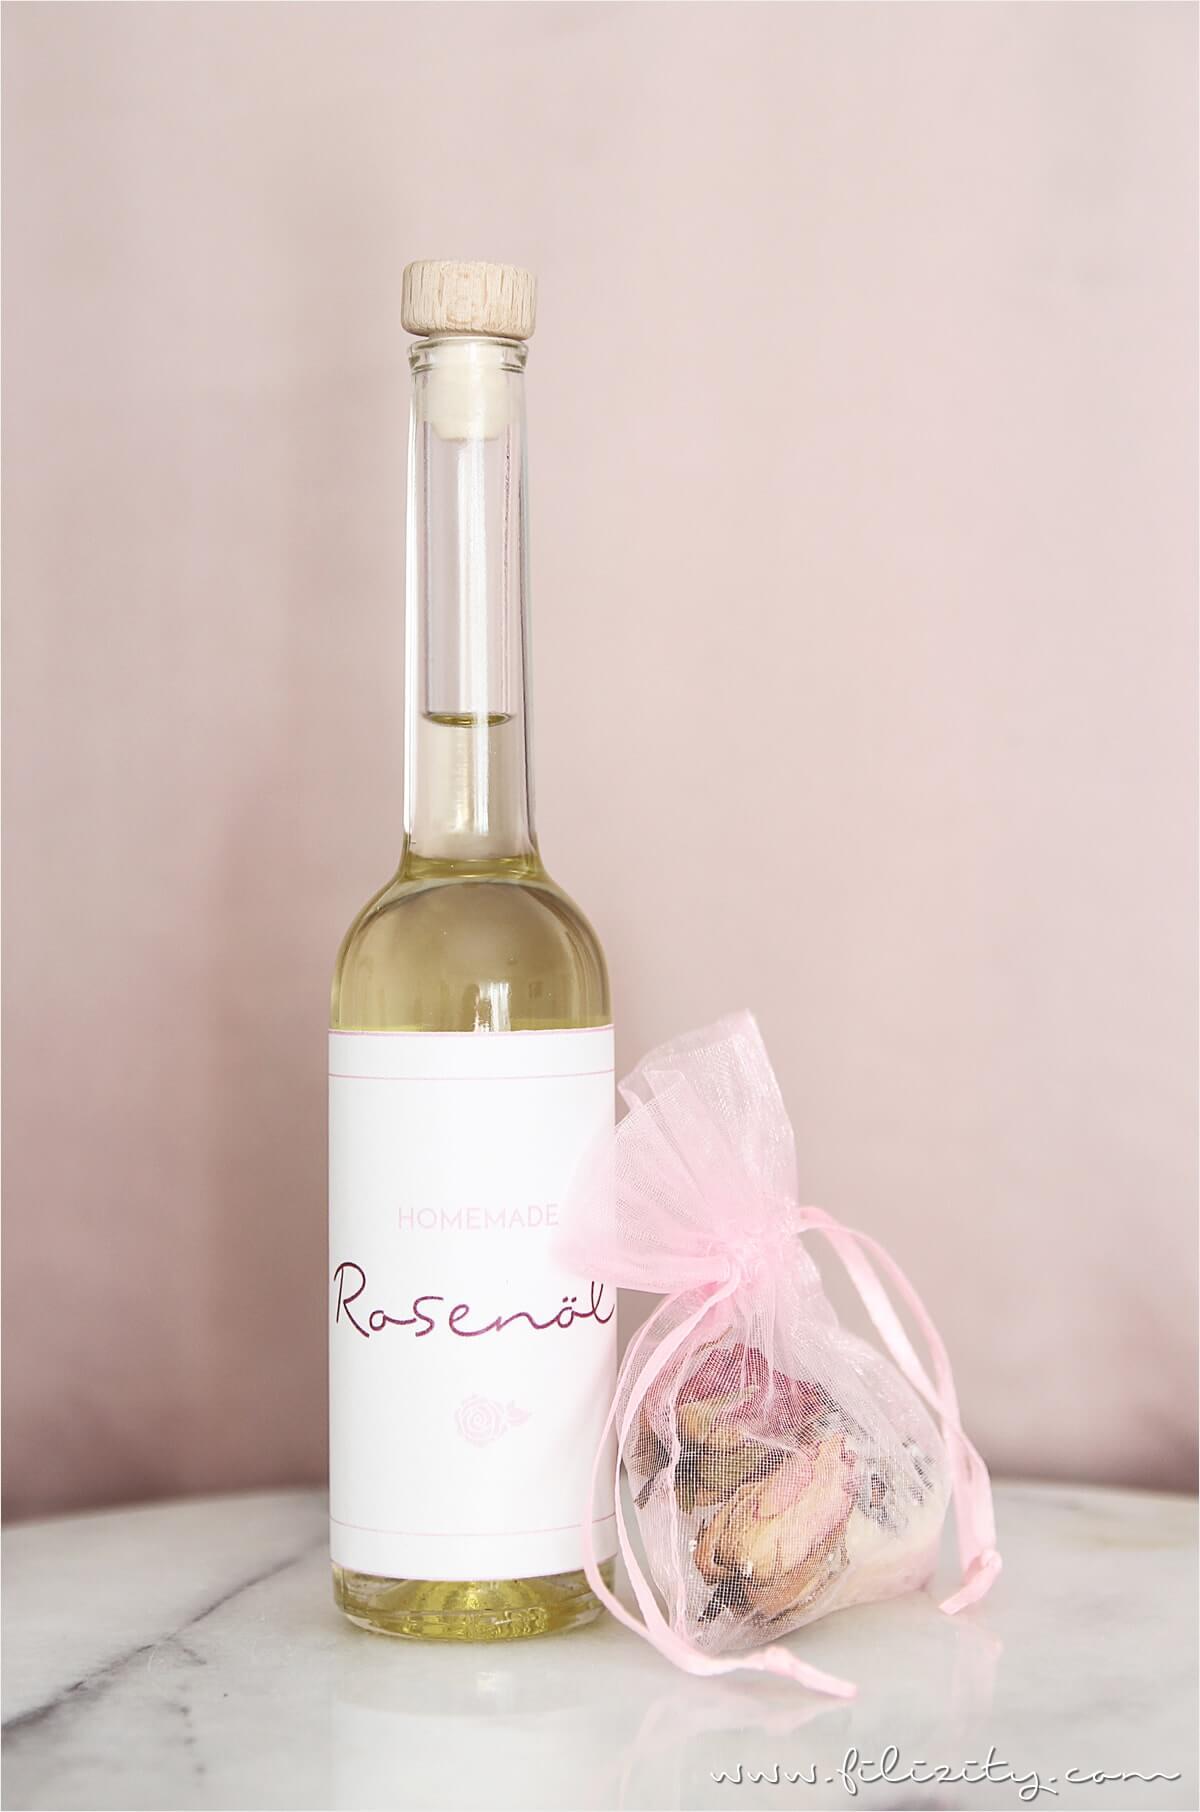 beauty diy rosenoel rose body oil koerper-oel haut-pflege valentinstag geschenk filizity Muttertagsgeschenk_selbermachen